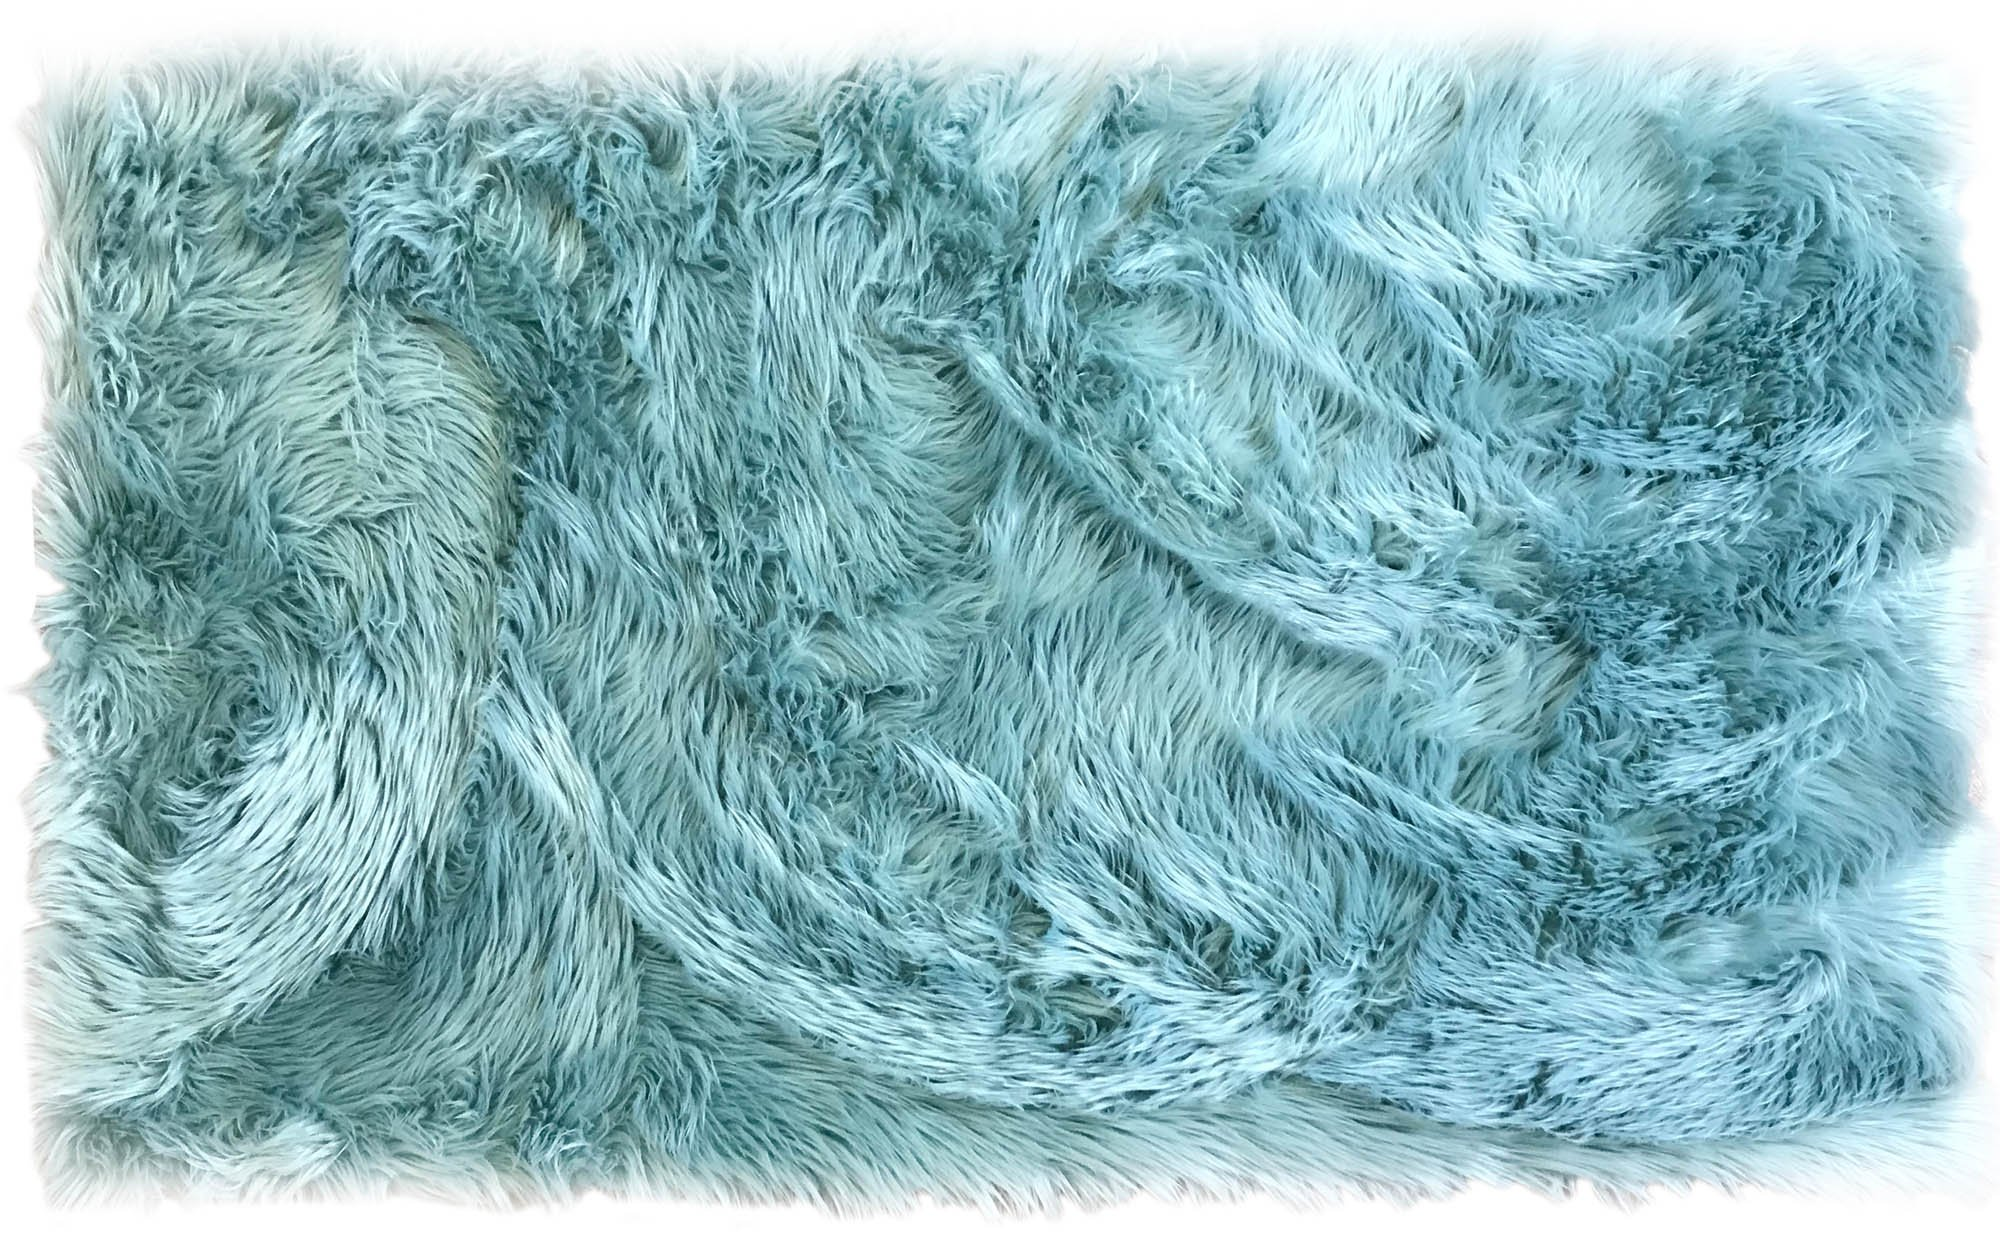 Serene Super Soft Faux Sheepskin Shag Silky Rug Baby Nursery Childrens Room Rug Teal, 2' x 3'